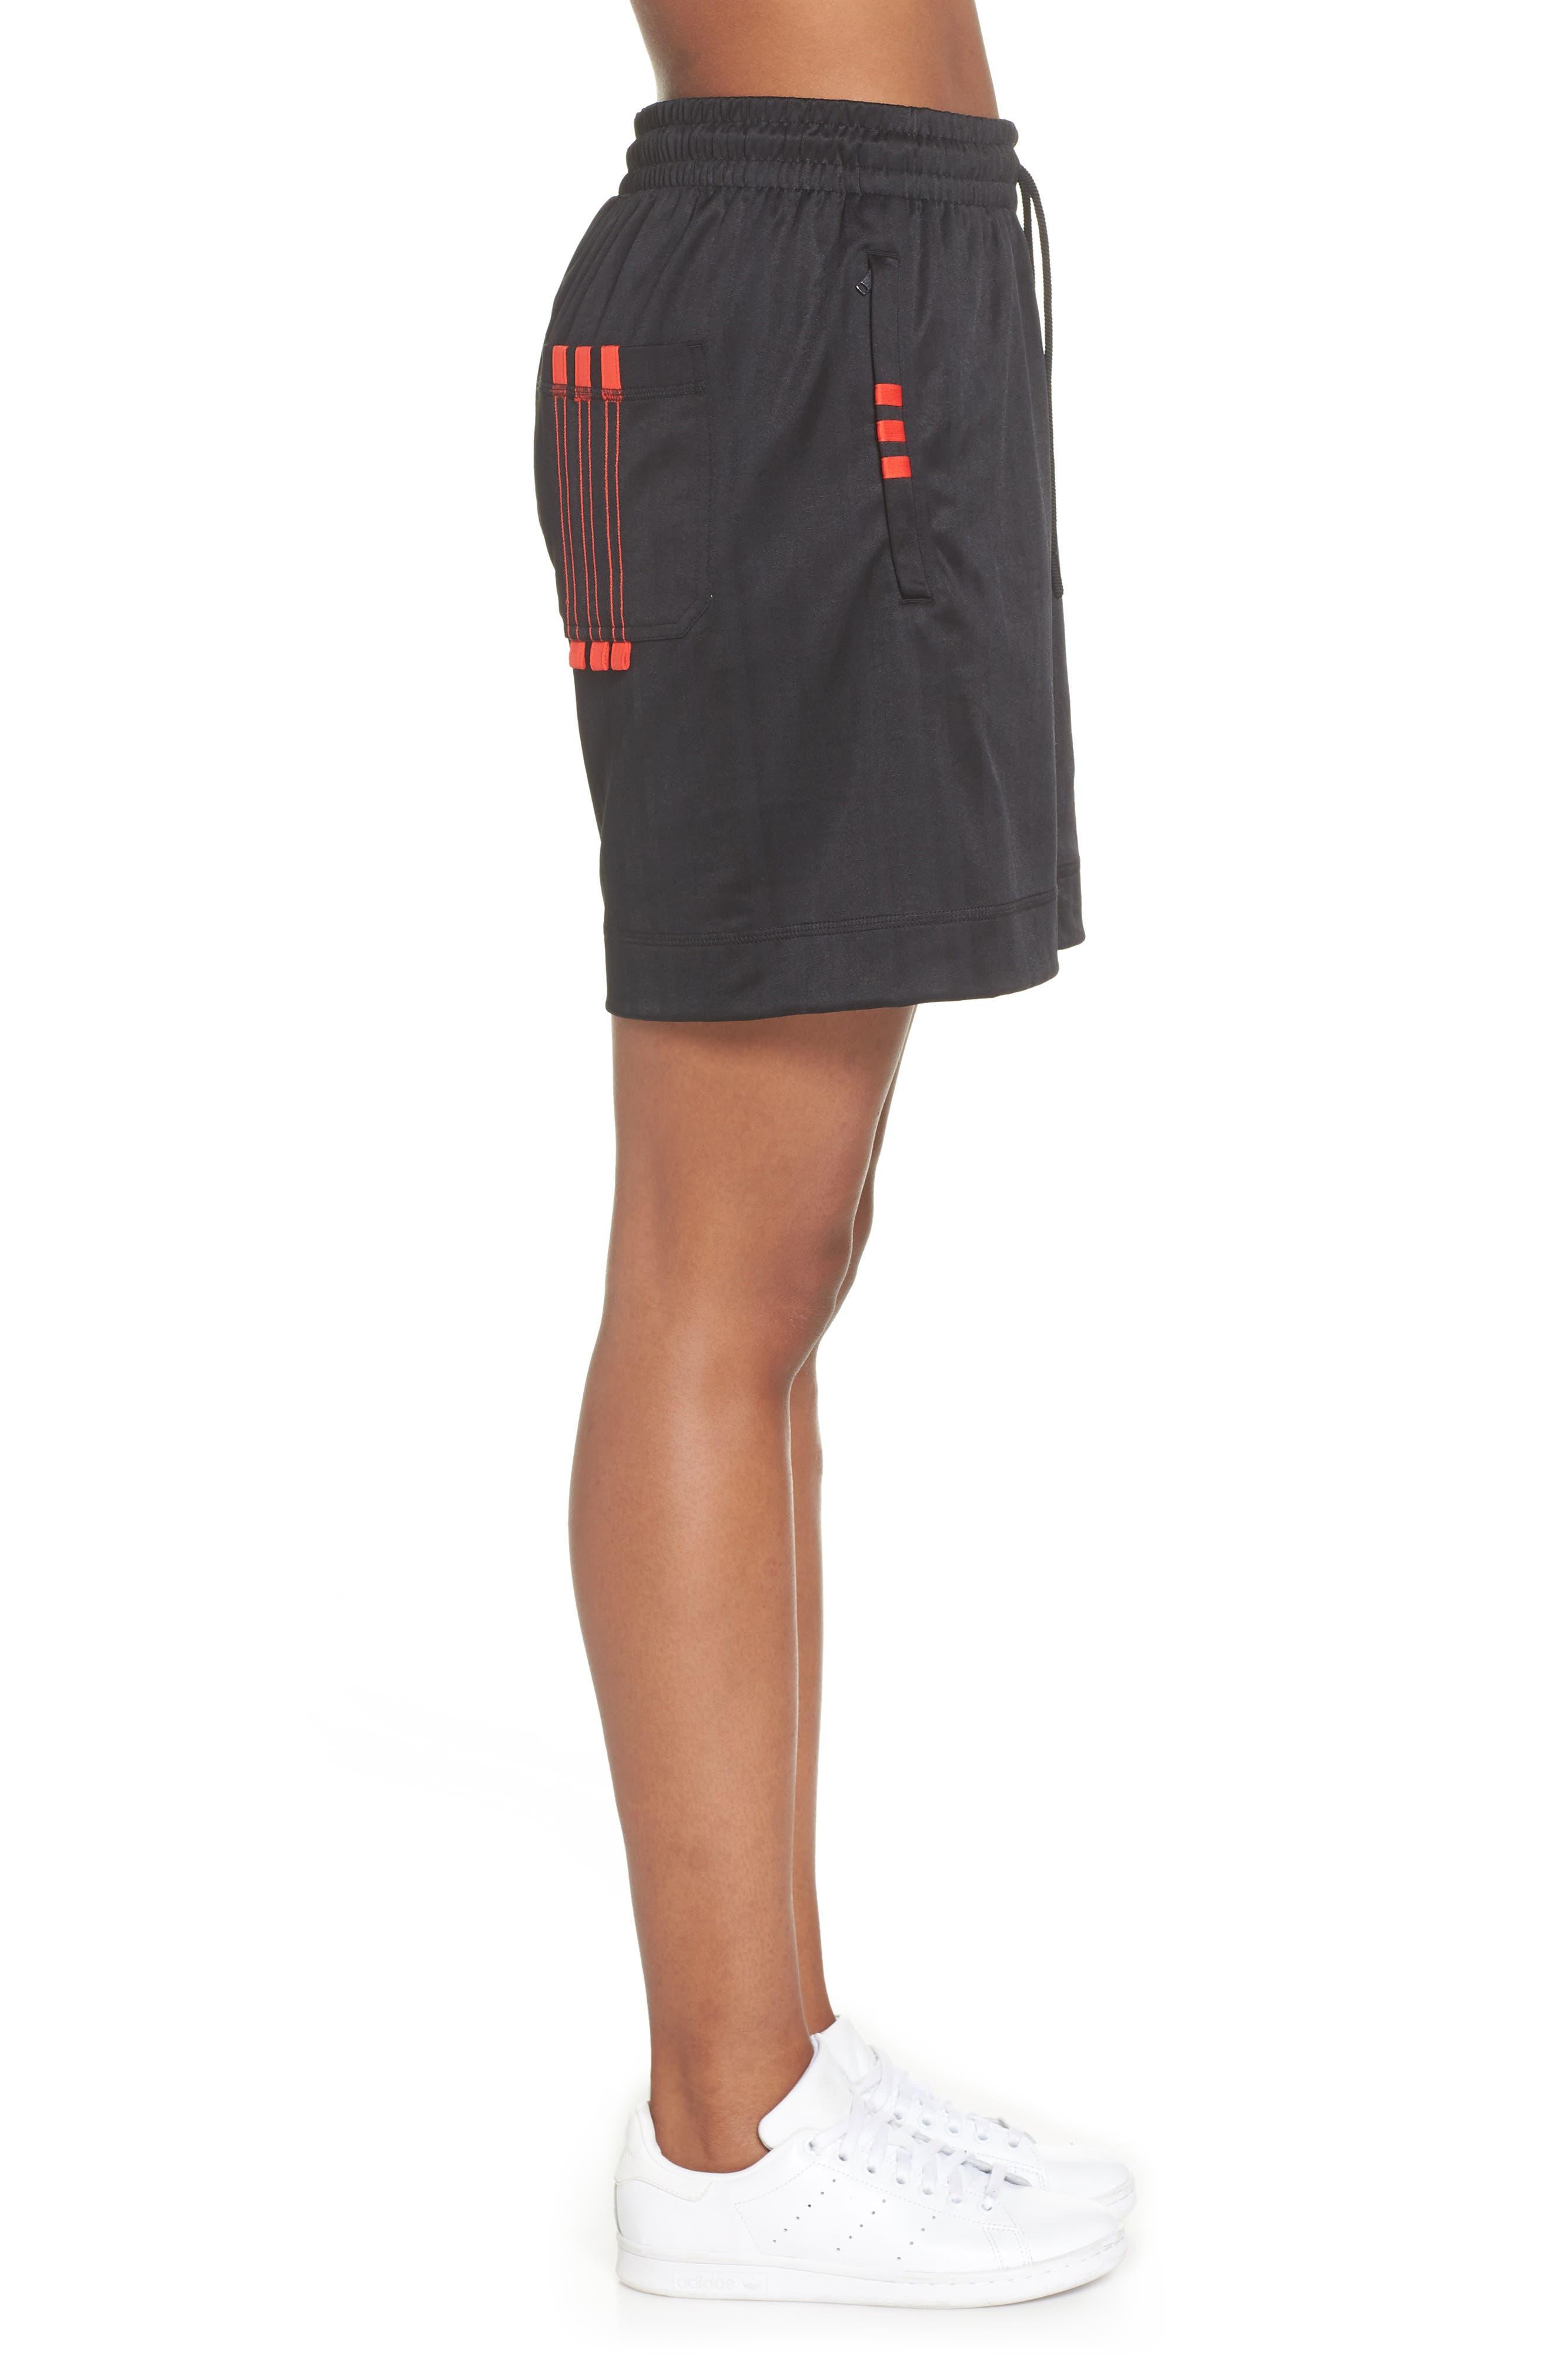 Soccer Shorts,                             Alternate thumbnail 3, color,                             Black/ Core Red